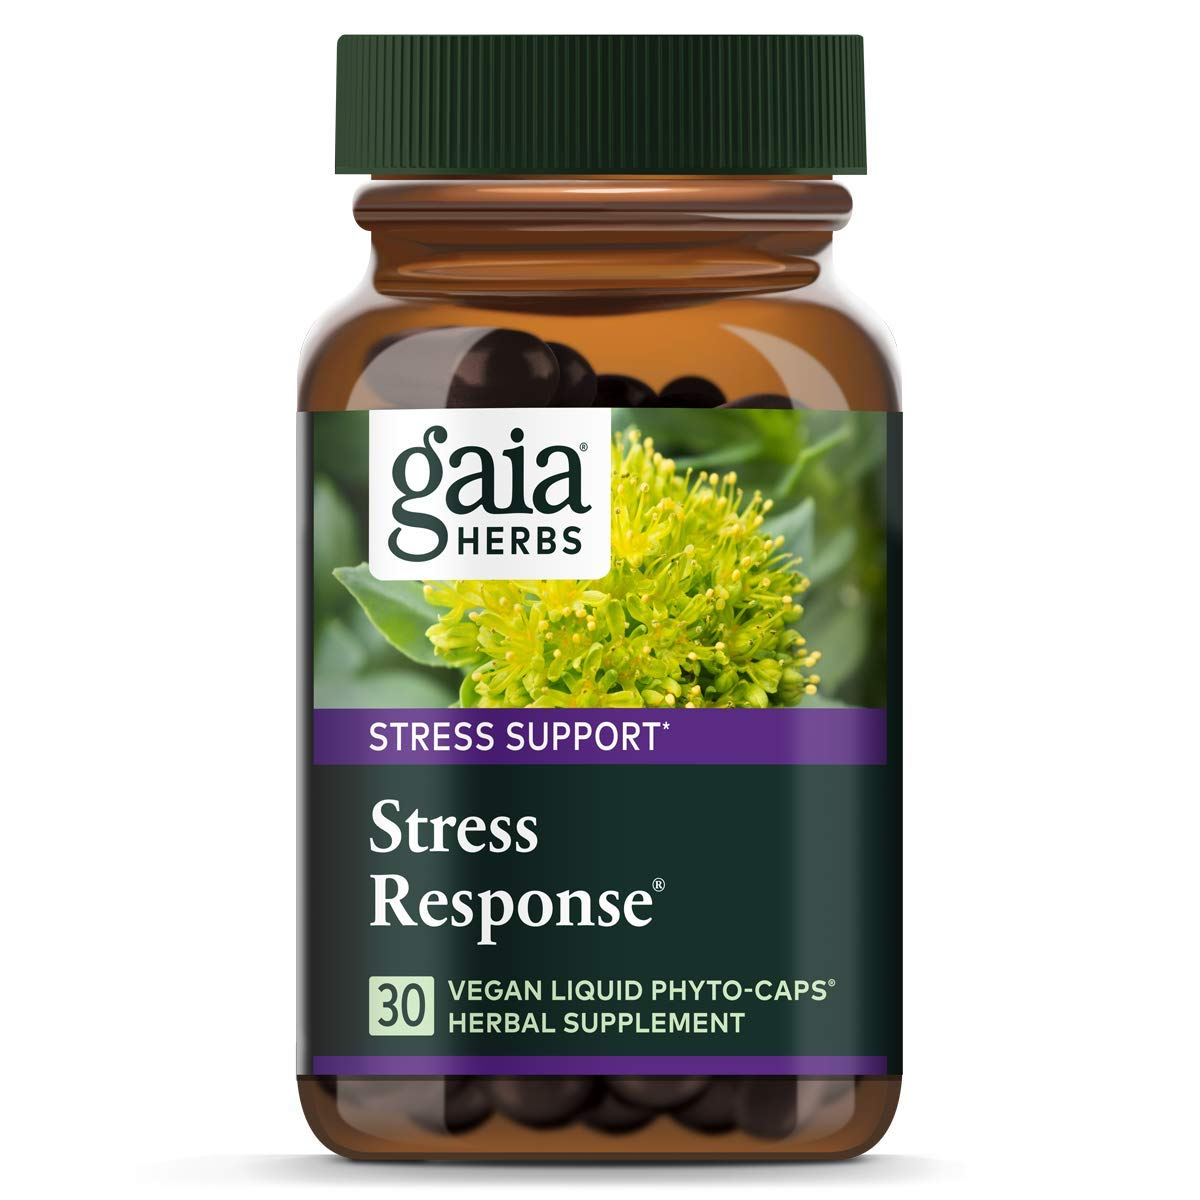 Gaia Herbs Stress Response, Vegan Liquid Capsules, 30 Count (Pack of 2) - Natural Stress Relief & Adrenal Fatigue Supplement, Calming Adaptogen Formula with Rhodiola, Ashwagandha, Holy Basil